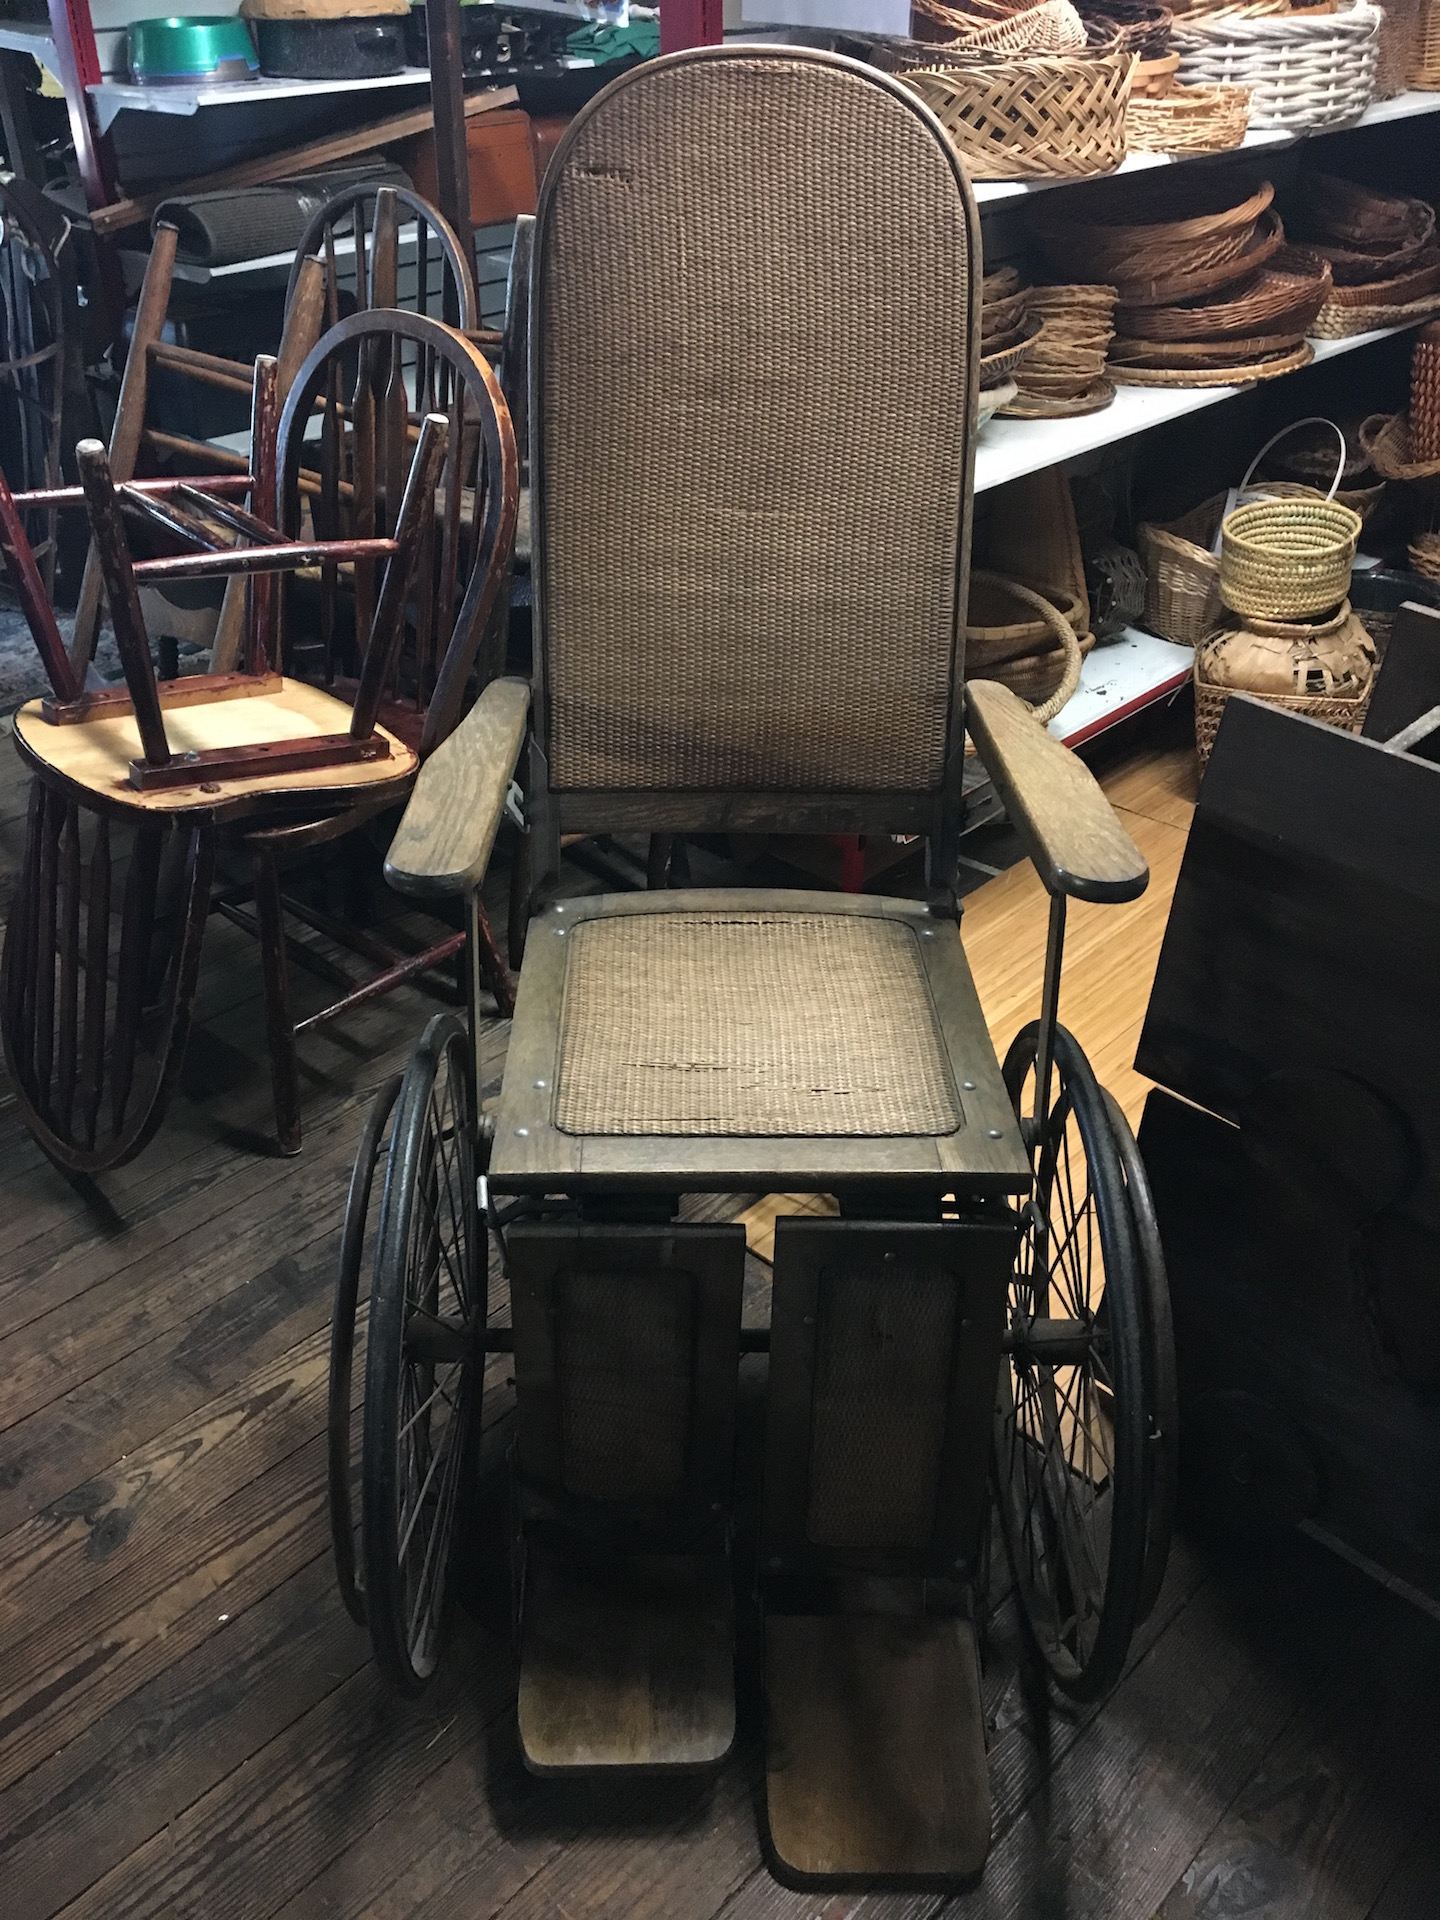 Wheel chair, Vintage